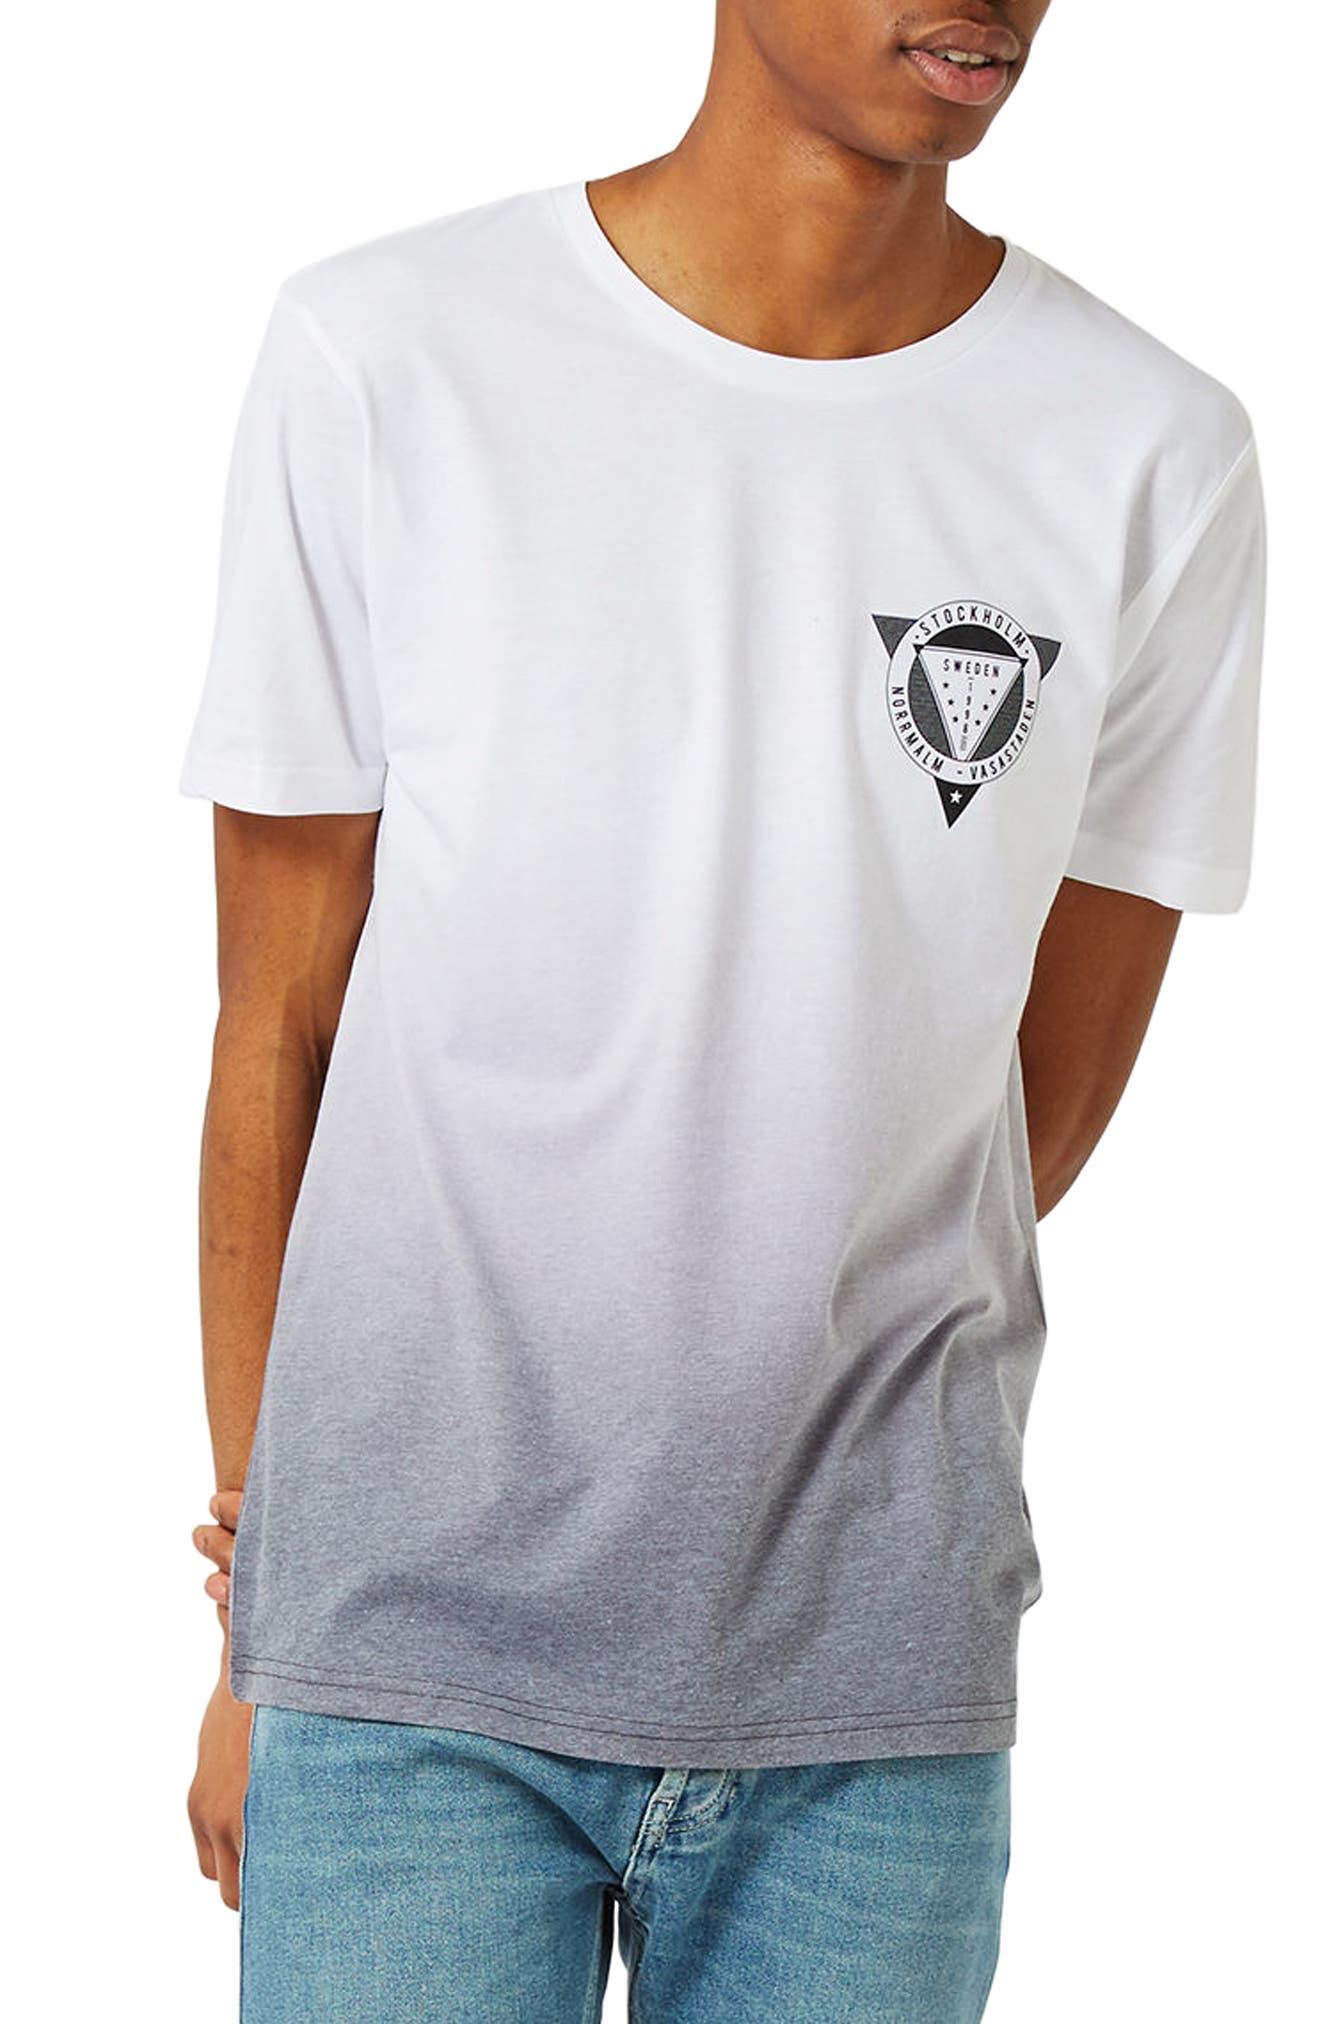 1998 Sweden Slim Fit Graphic T-Shirt,                         Main,                         color, White Multi